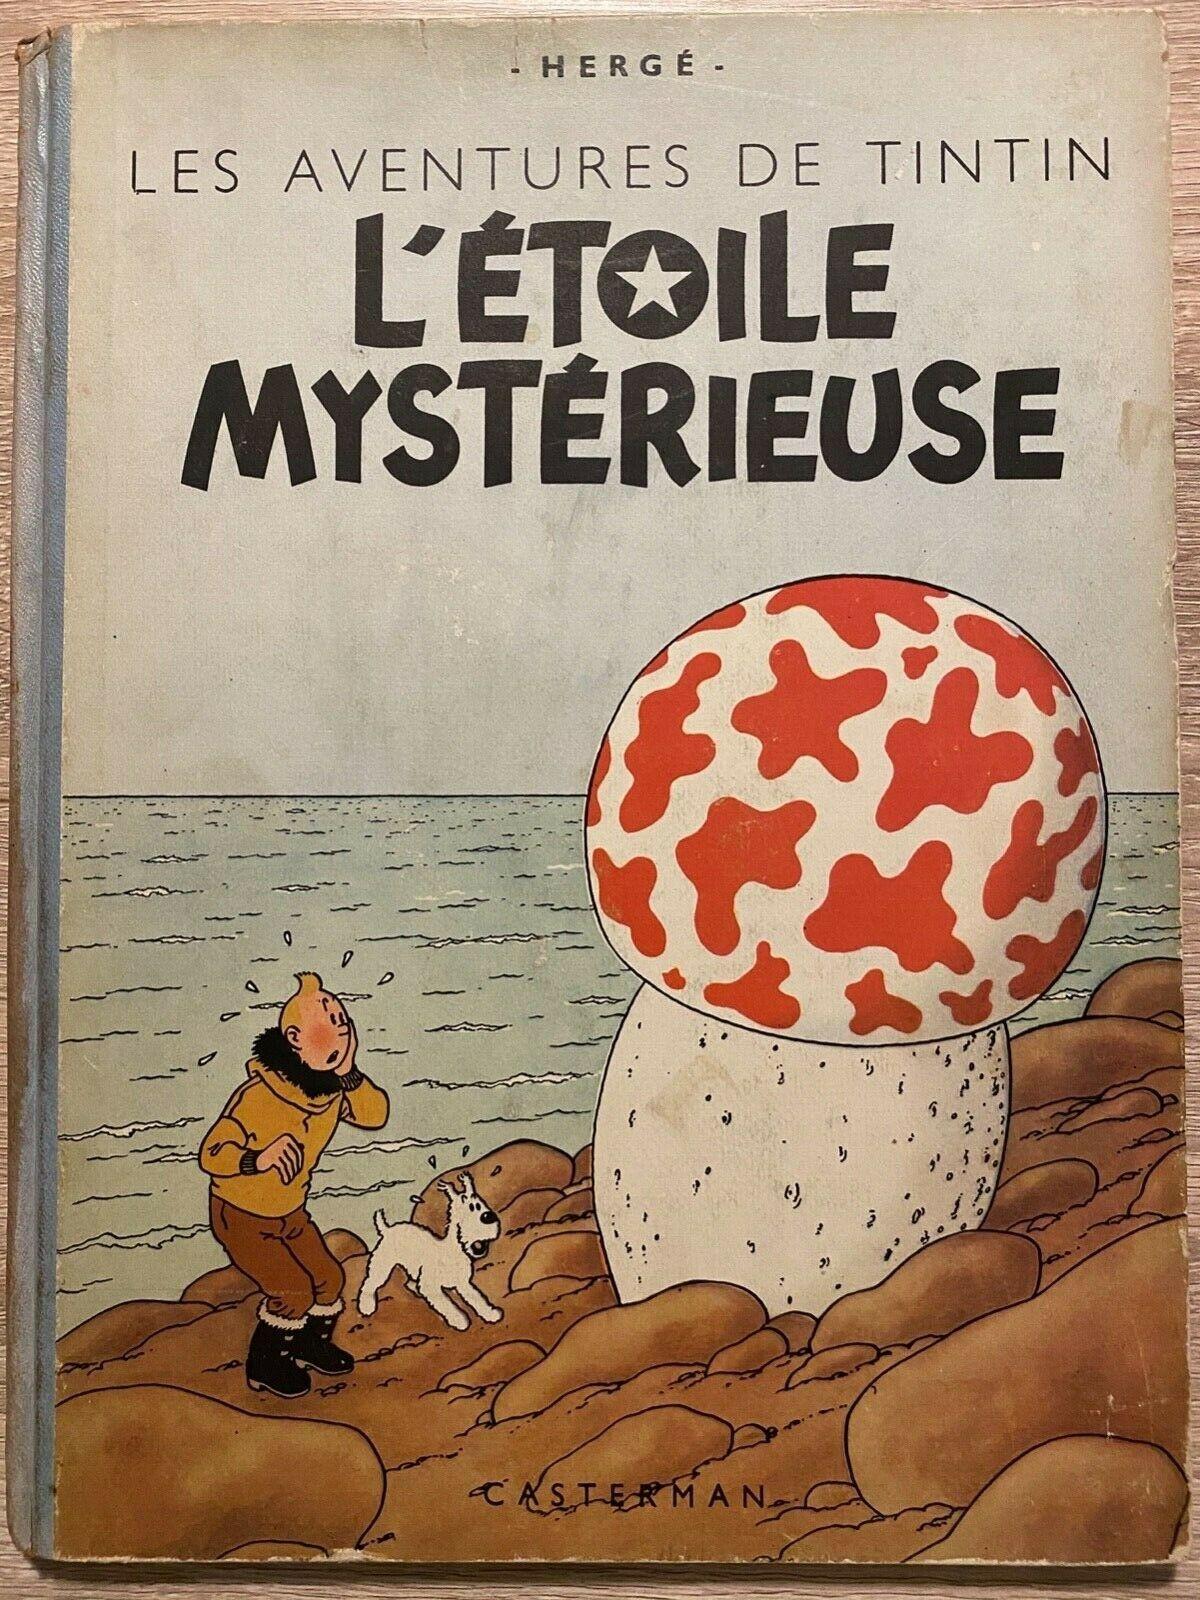 Tintin - L'étoile mystérieuse - 1946 - B1 - Hergé - Editions Casterman